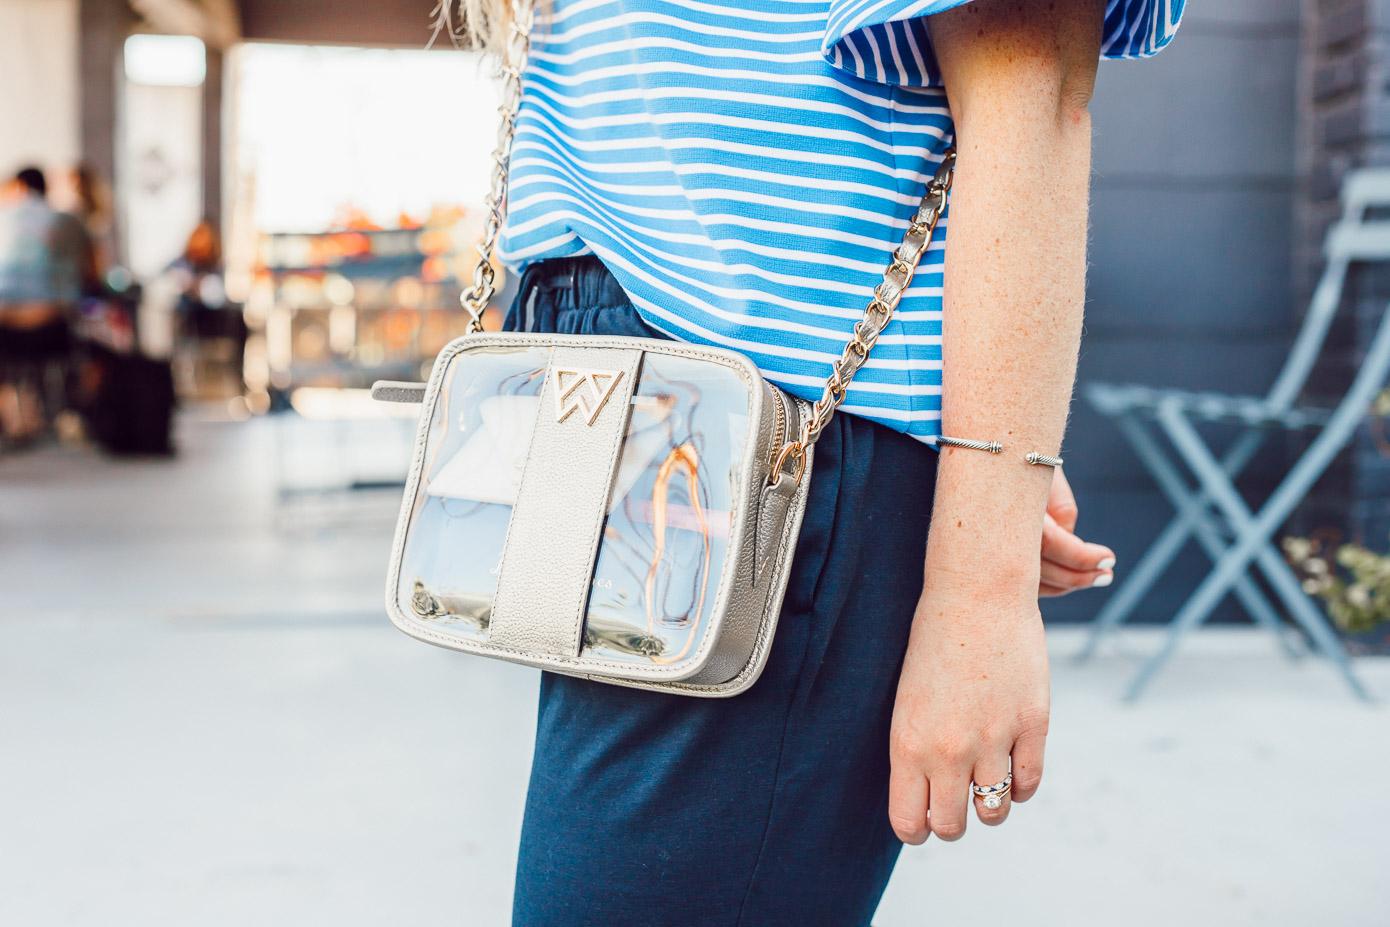 Clear Crossbody Handbag, Kelly Wynne | Casual Summer Outfit Idea featured on Louella Reese Blog